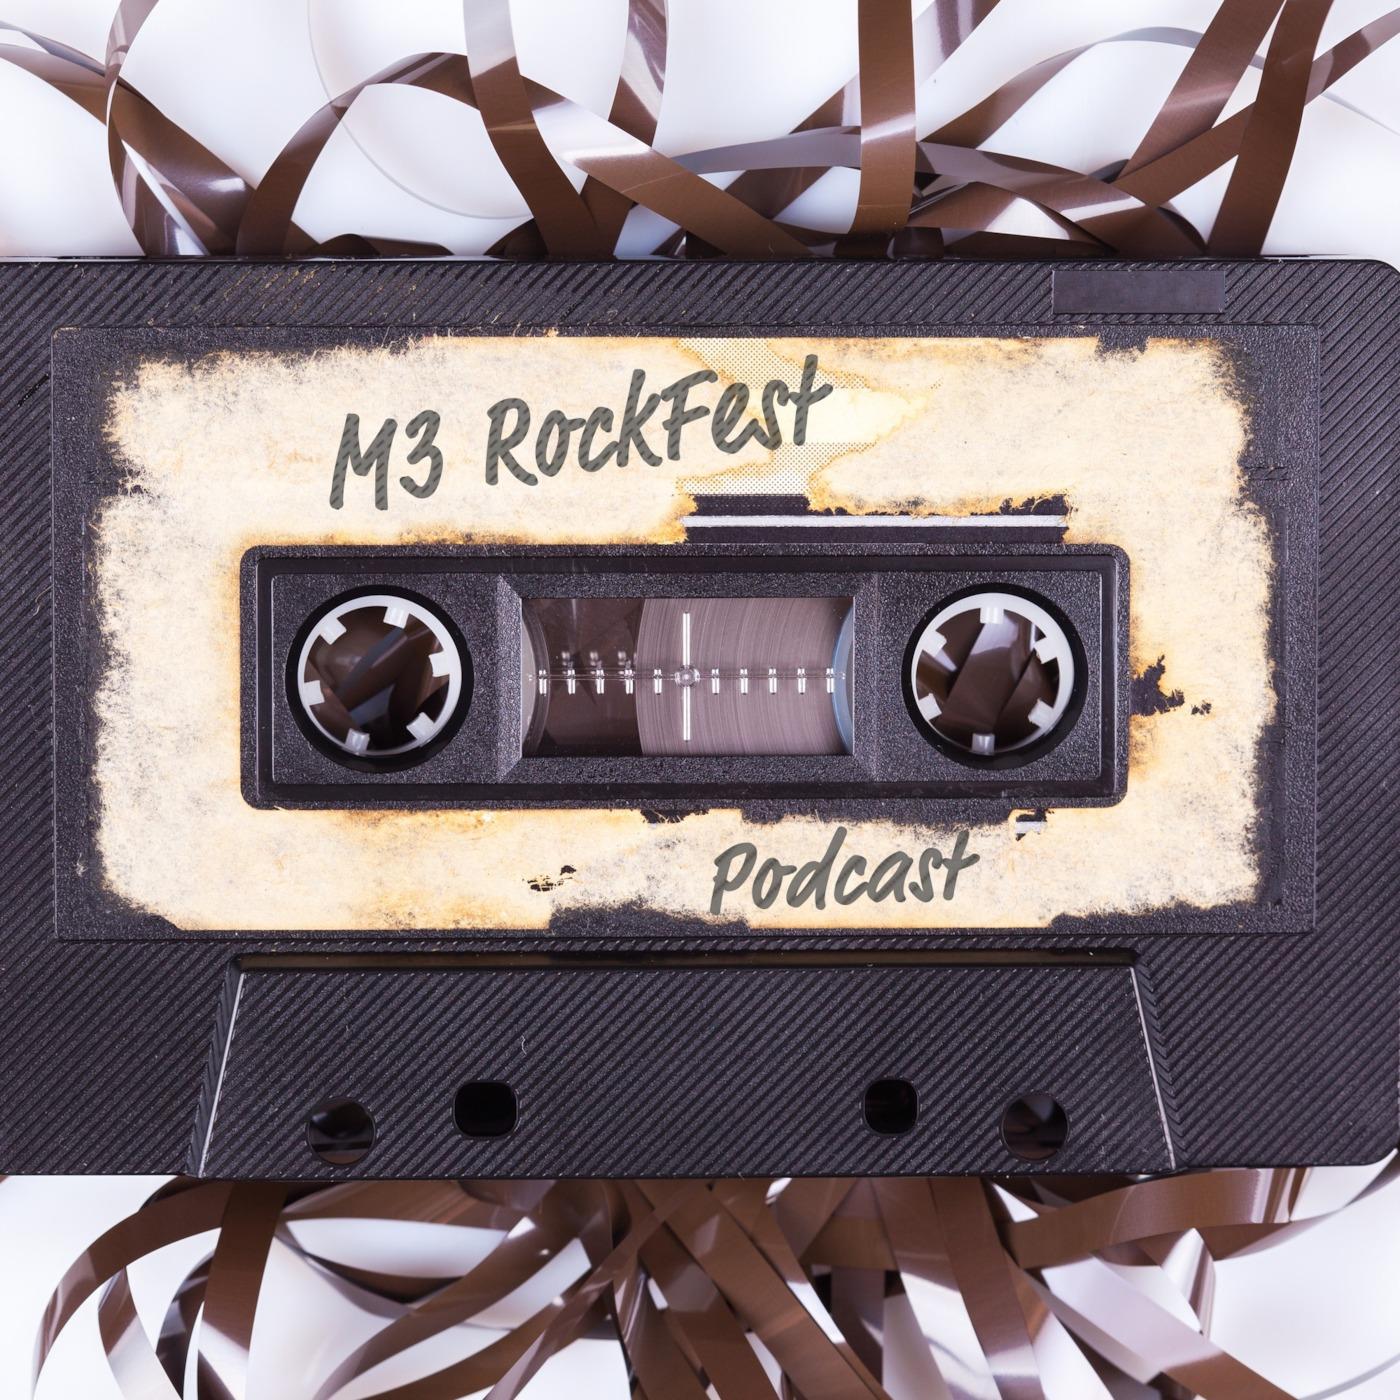 M3 Rockfest Podcast